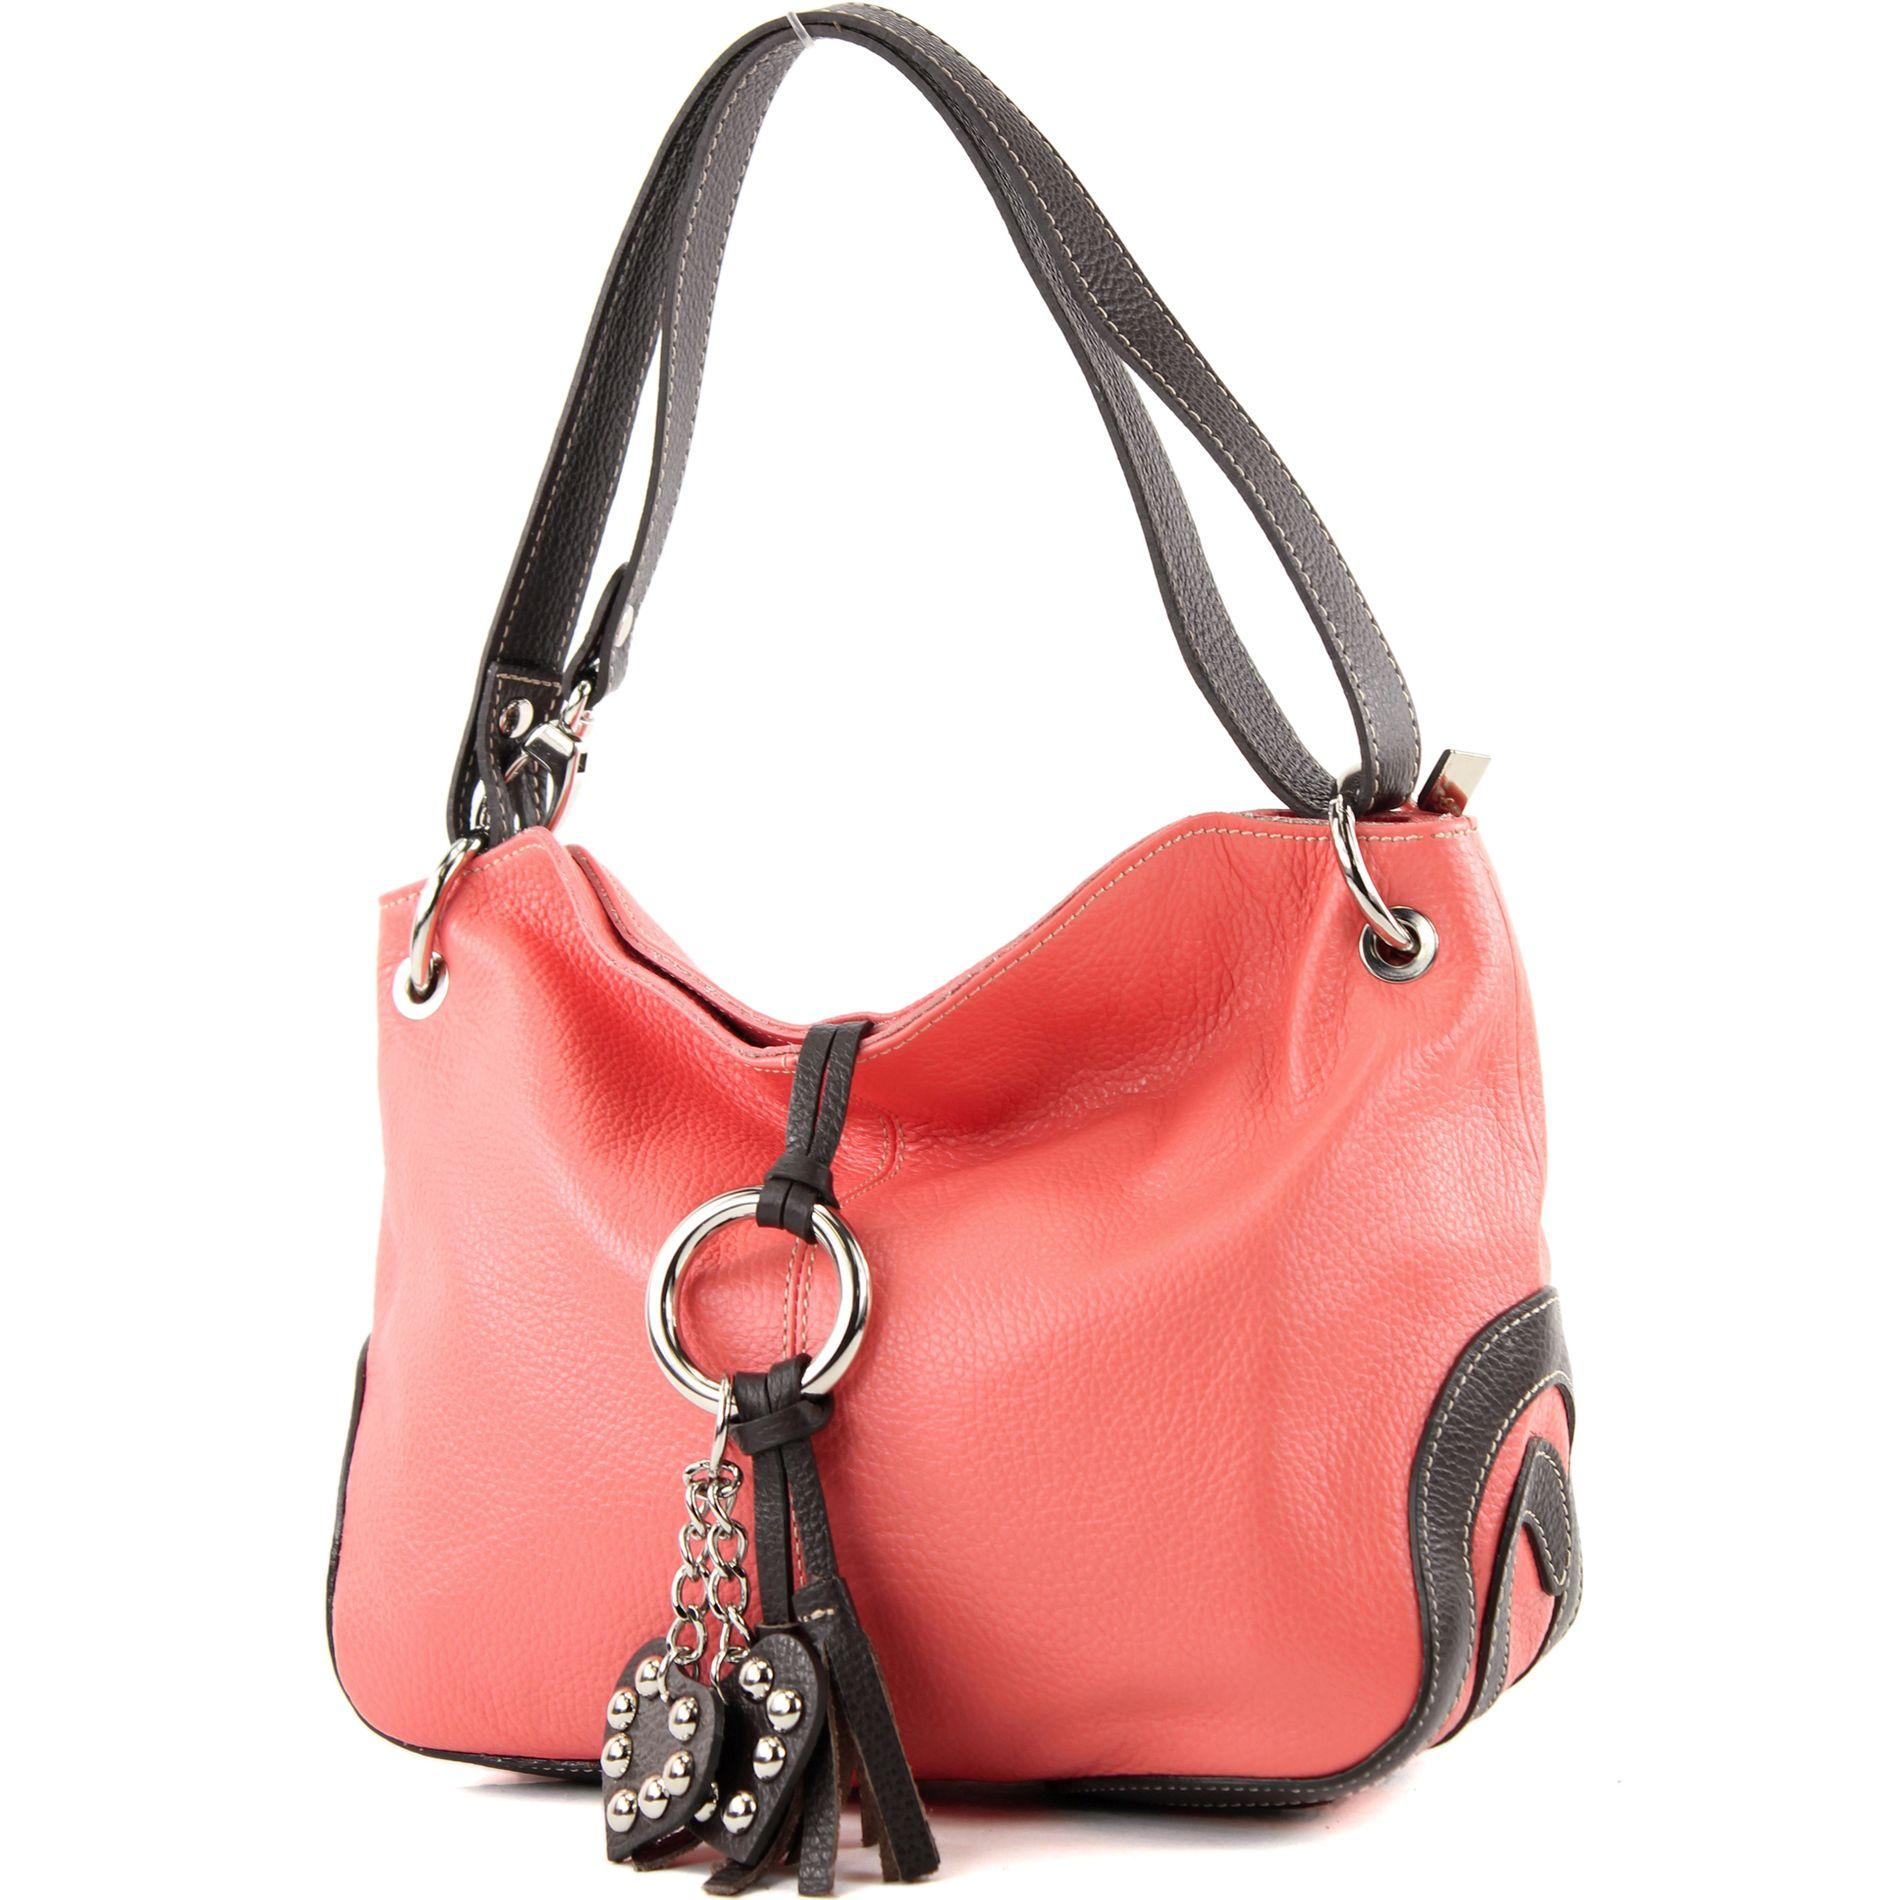 Handtasche Ledertasche Tragetasche Echt Leder kleine Damenhandtasche 331 ital